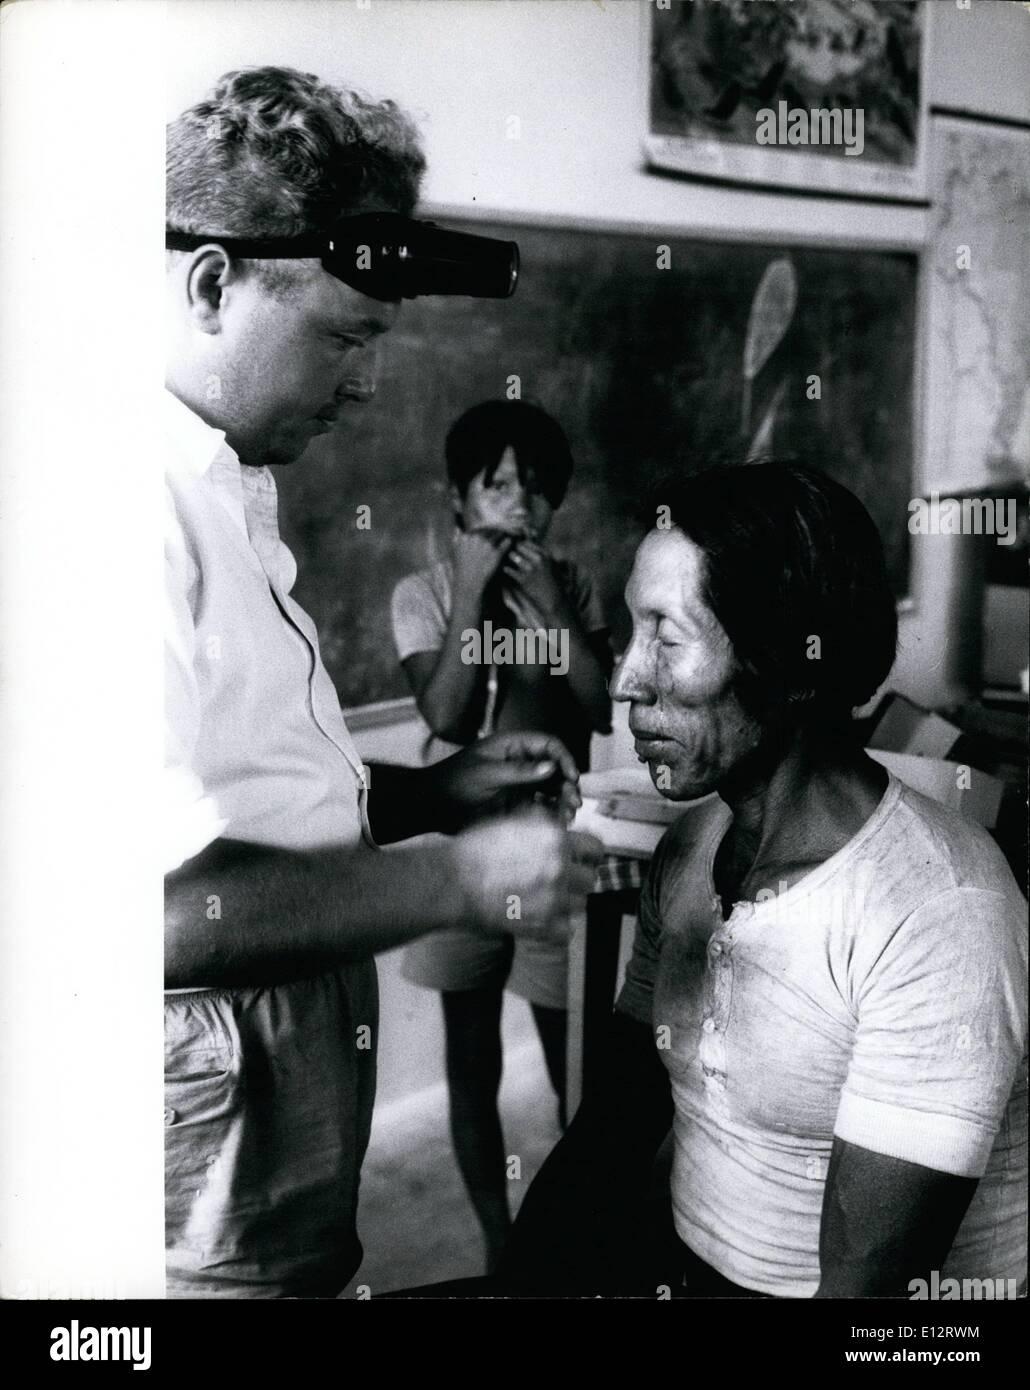 Feb. 25, 2012 - Brazilian Govt. Melisse care for Moto Indians of the Caraya tribe at Bernard Island. - Stock Image